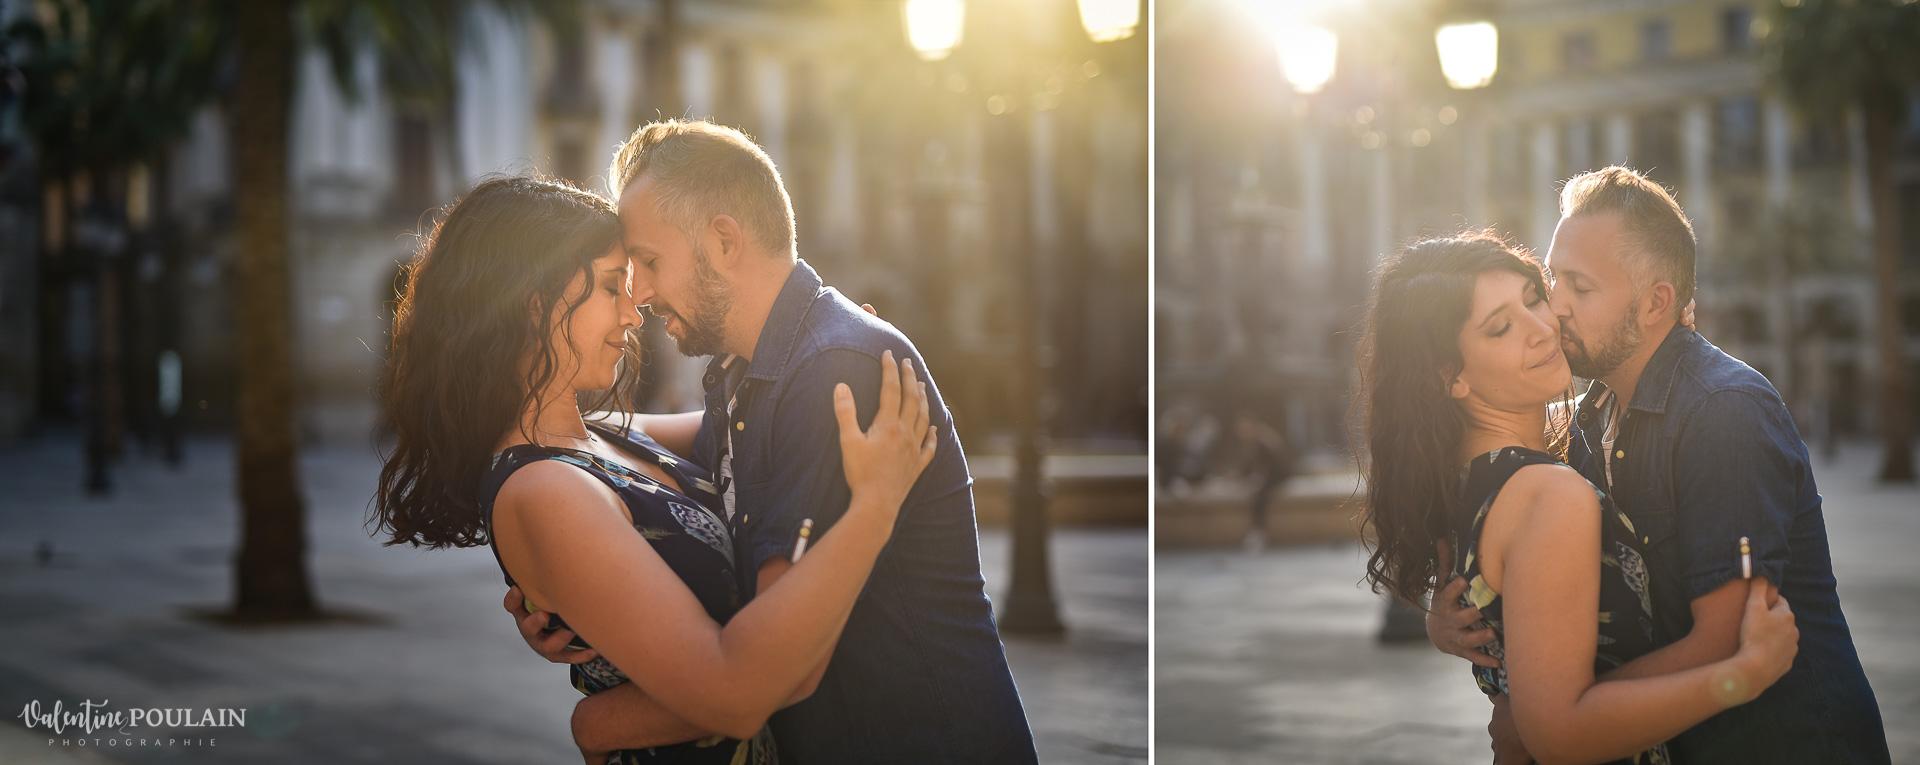 Seance photo couple Barcelone - Valentine Poulain love LIGHTS